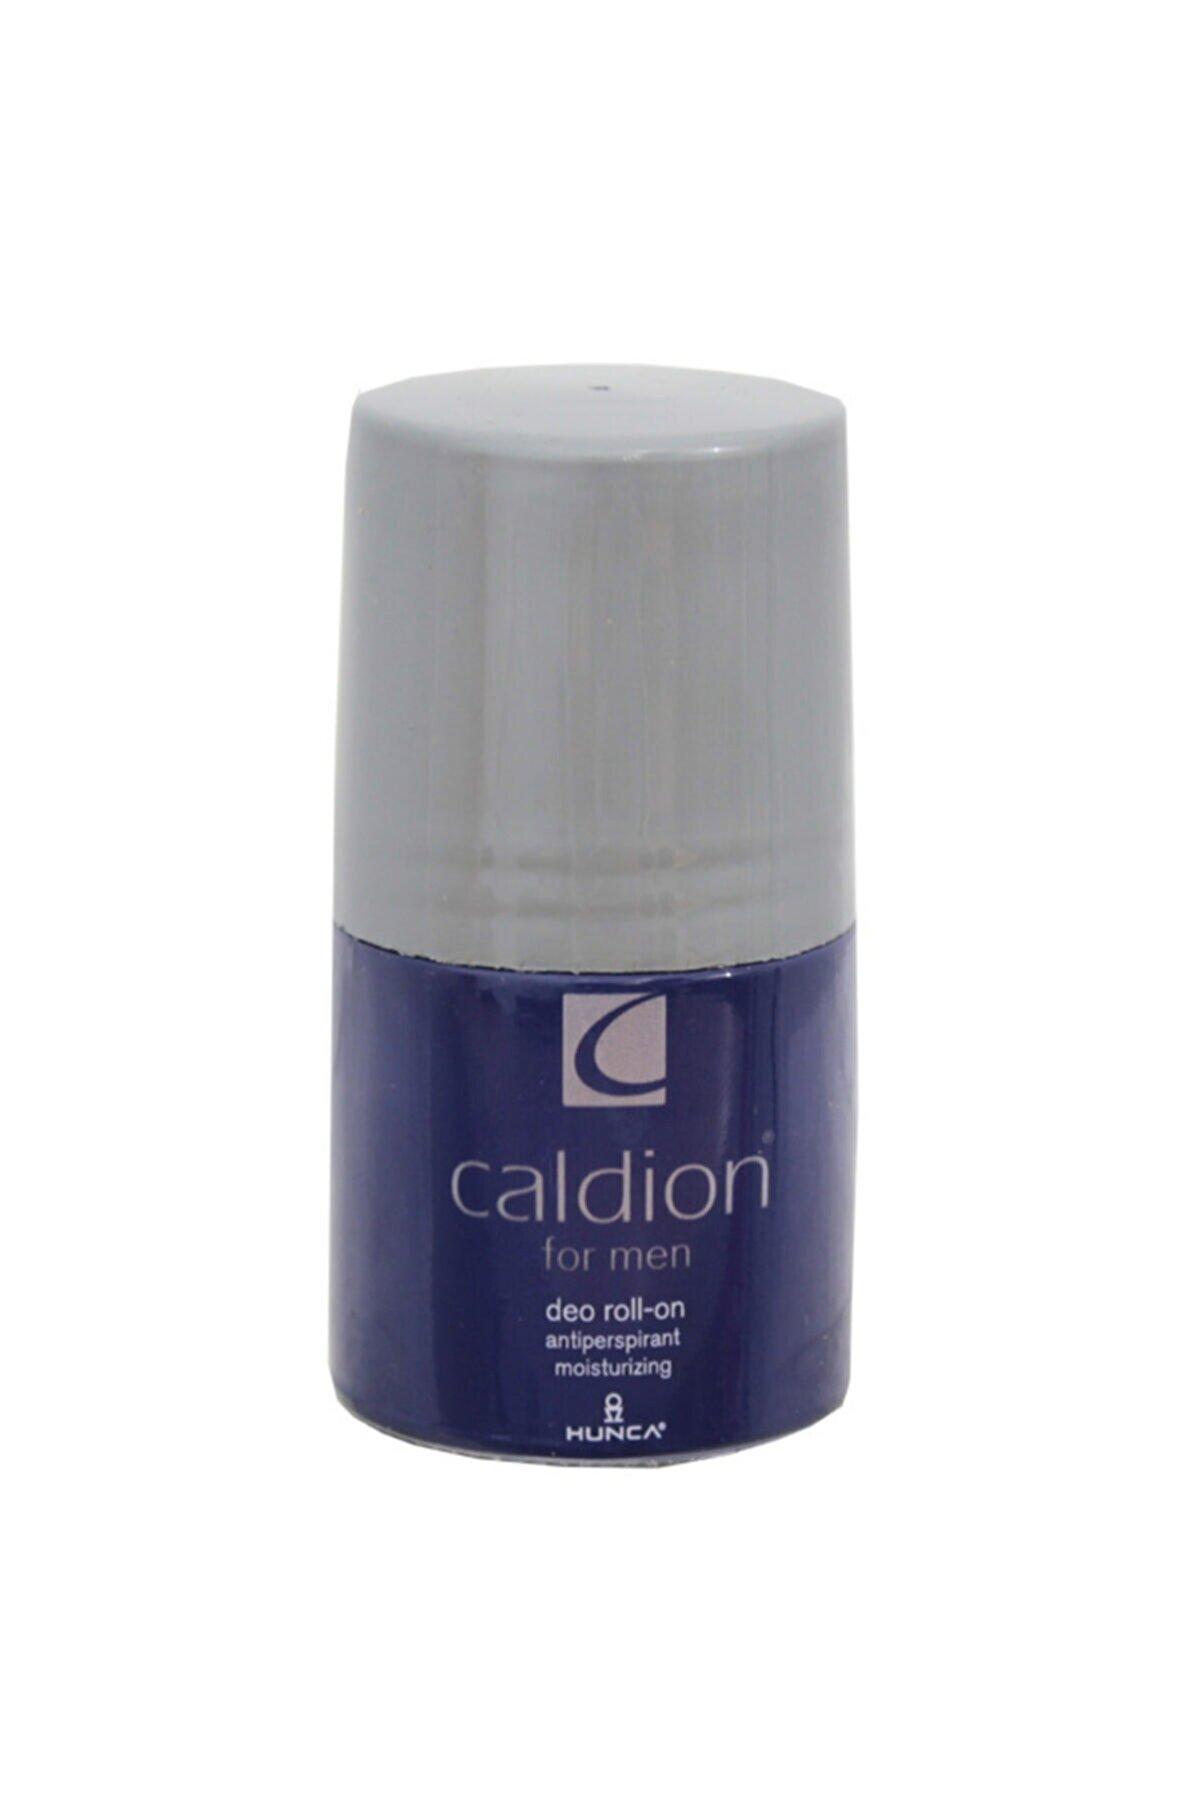 Caldion Erkek Roll-on 50 ml - 8690973030382